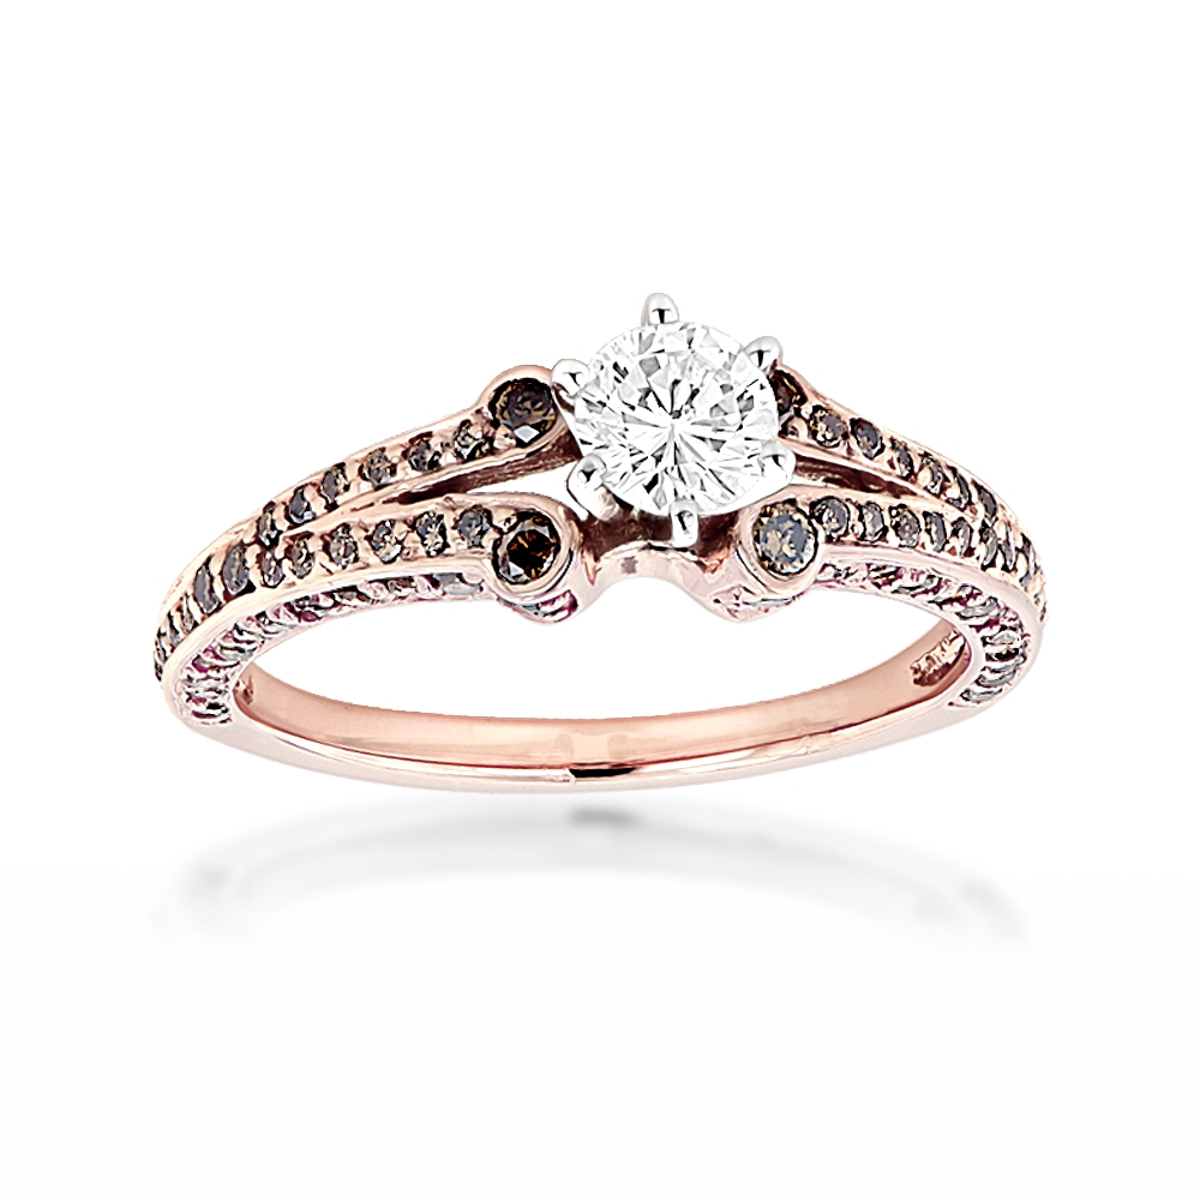 14K Rose Gold Unique Ladies White Brown Diamond Engagement Ring 1.2ct